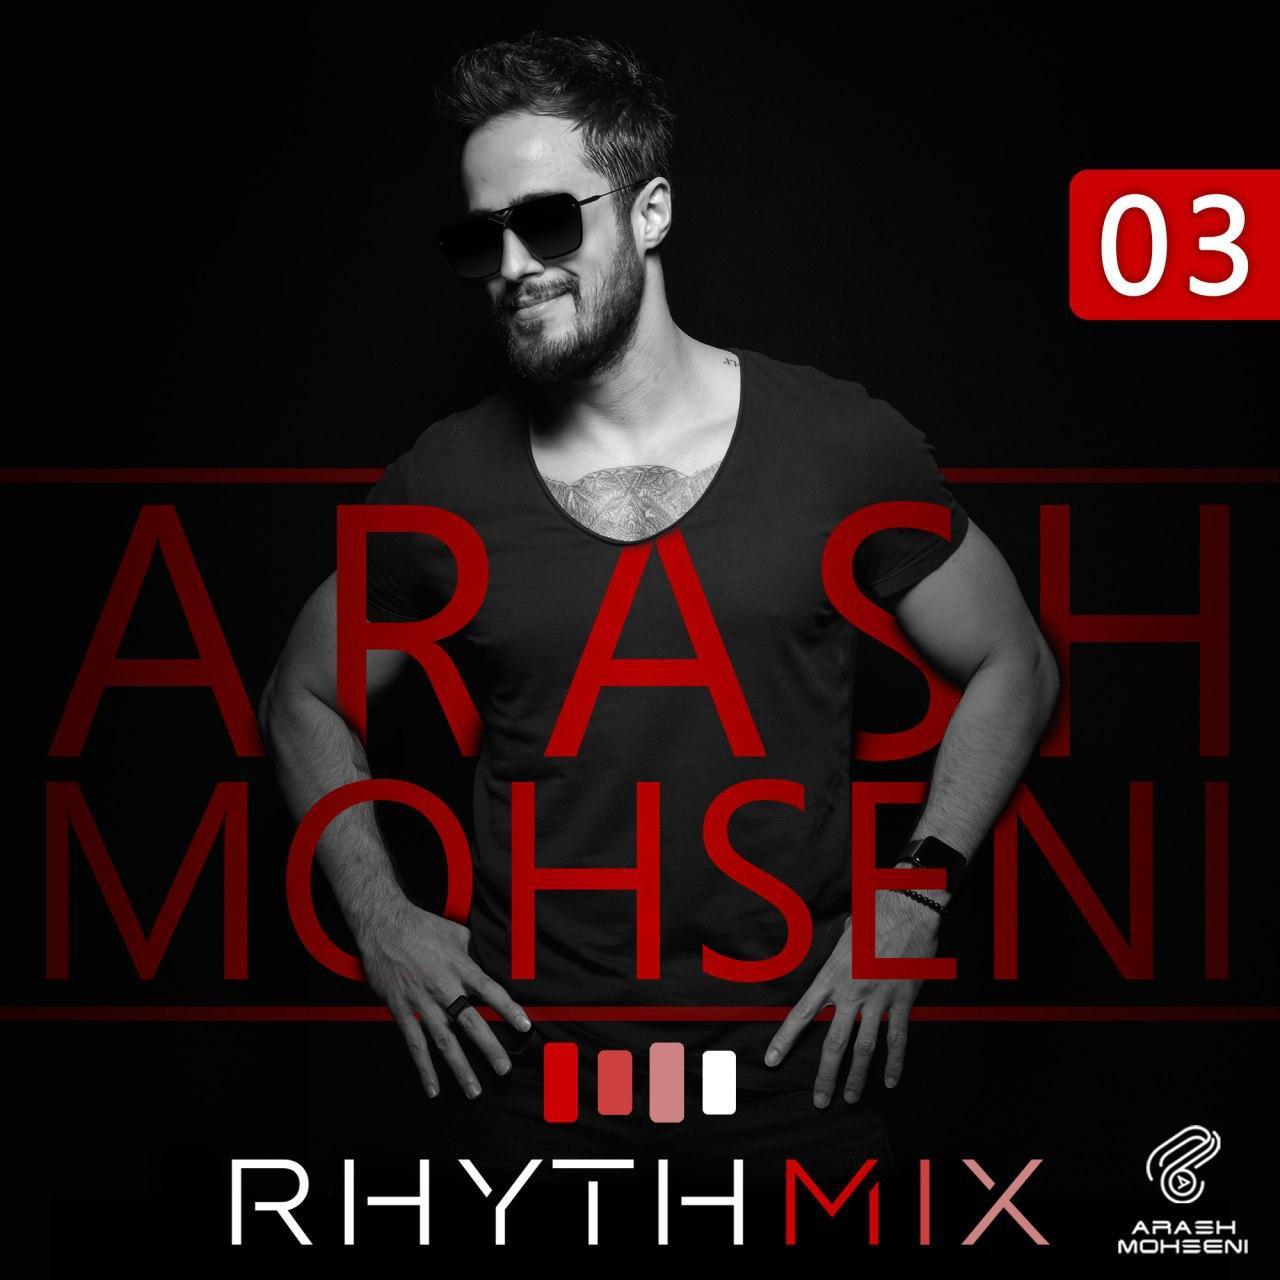 https://dl.tak3da.com/download/1398/09/Arash-Mohseni-Rhythmix-03-Cover.jpg